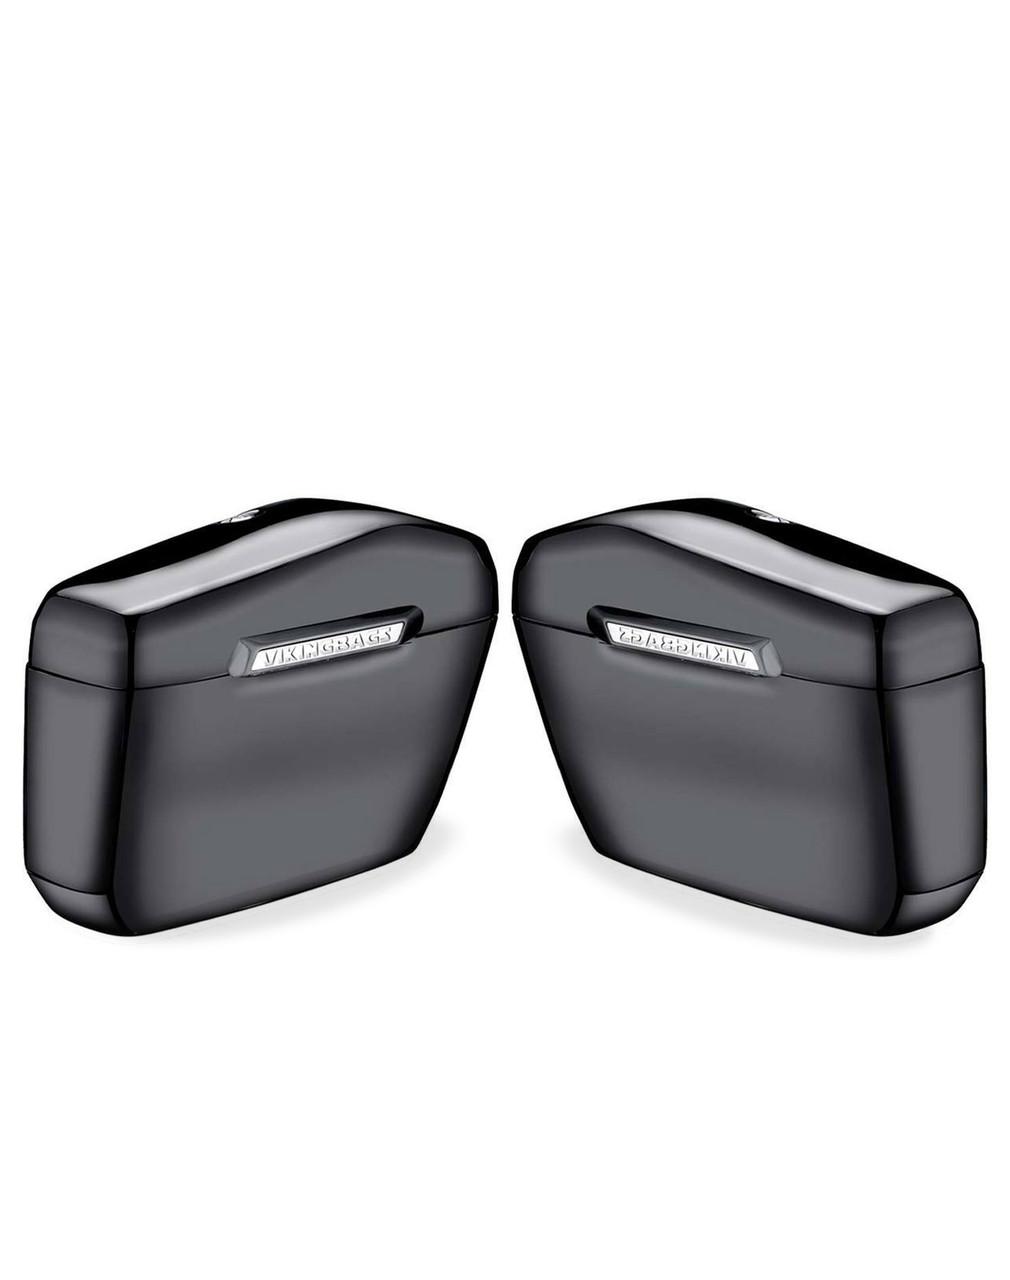 Honda VTX 1800 R (Retro) Viking Lamellar Large Black Hard Saddlebags Both Bags View